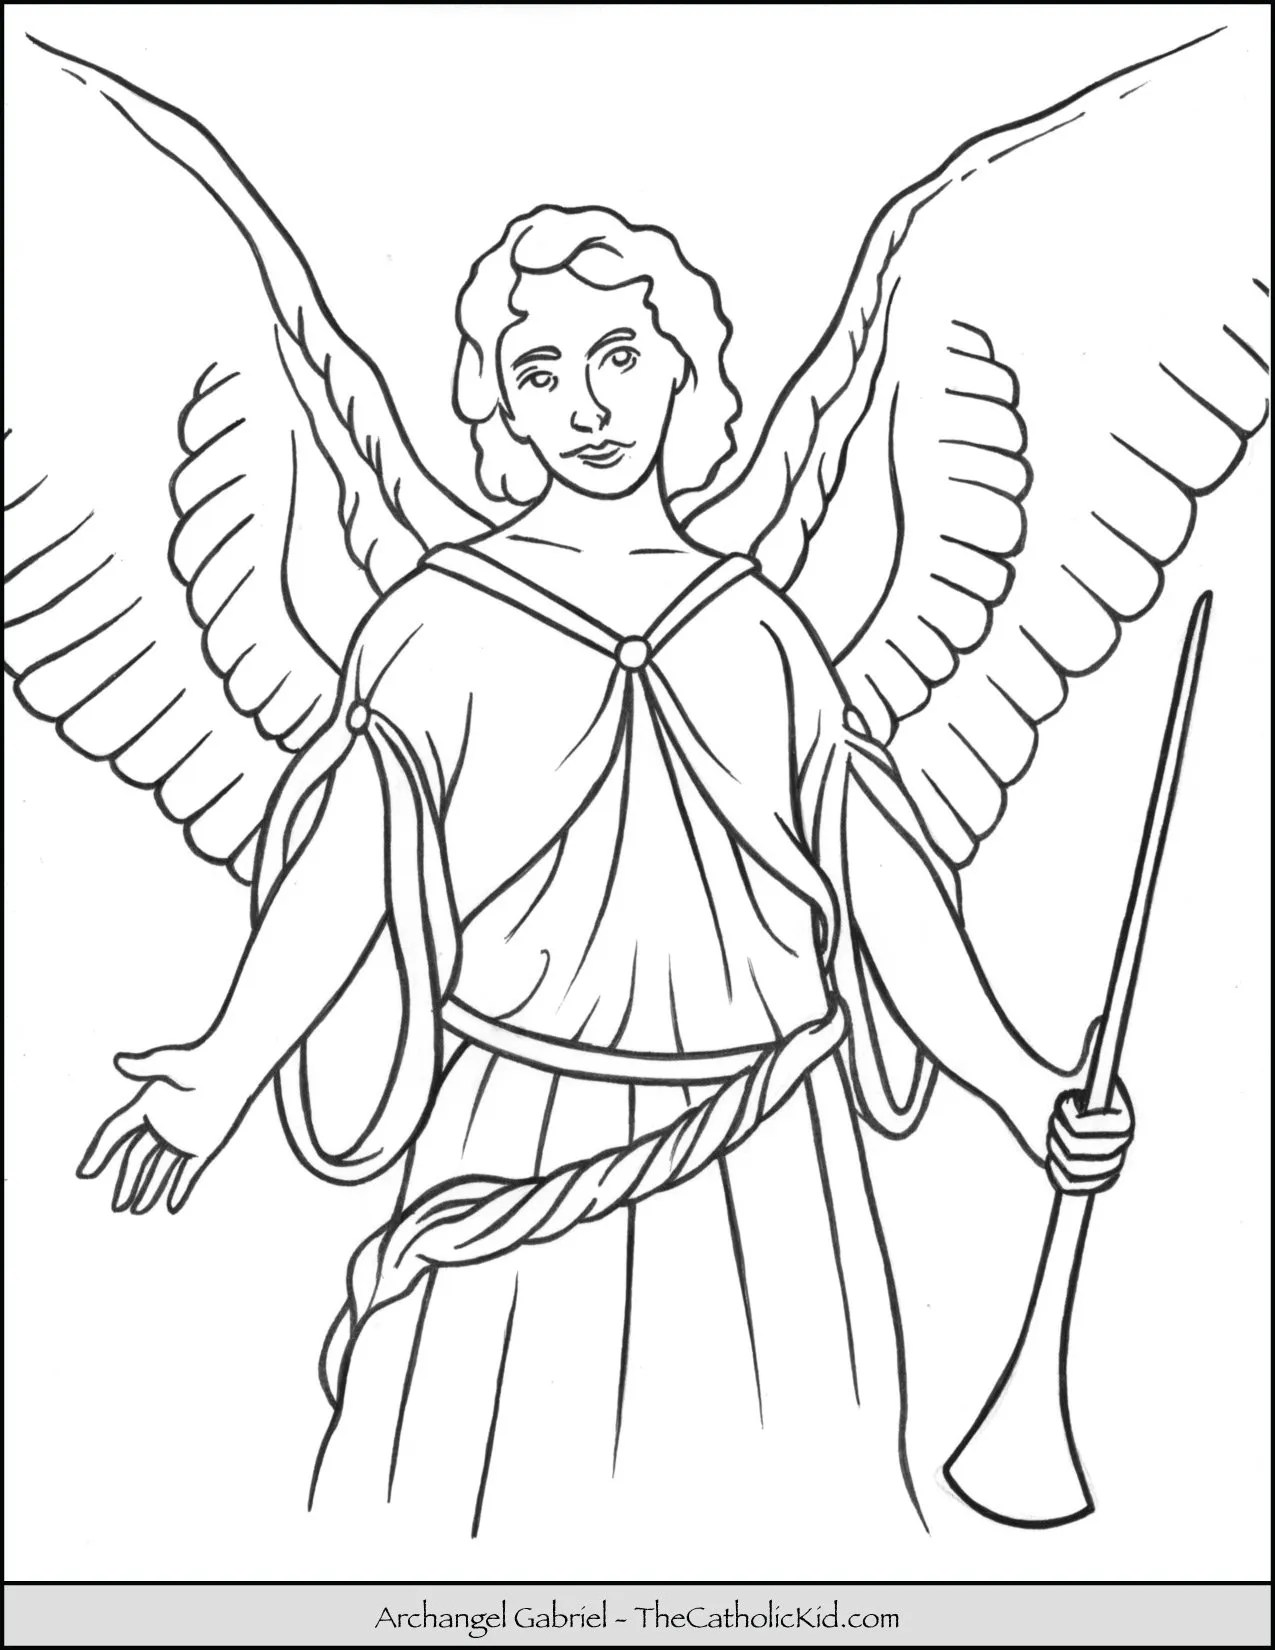 Archangel Gabriel Coloring Page